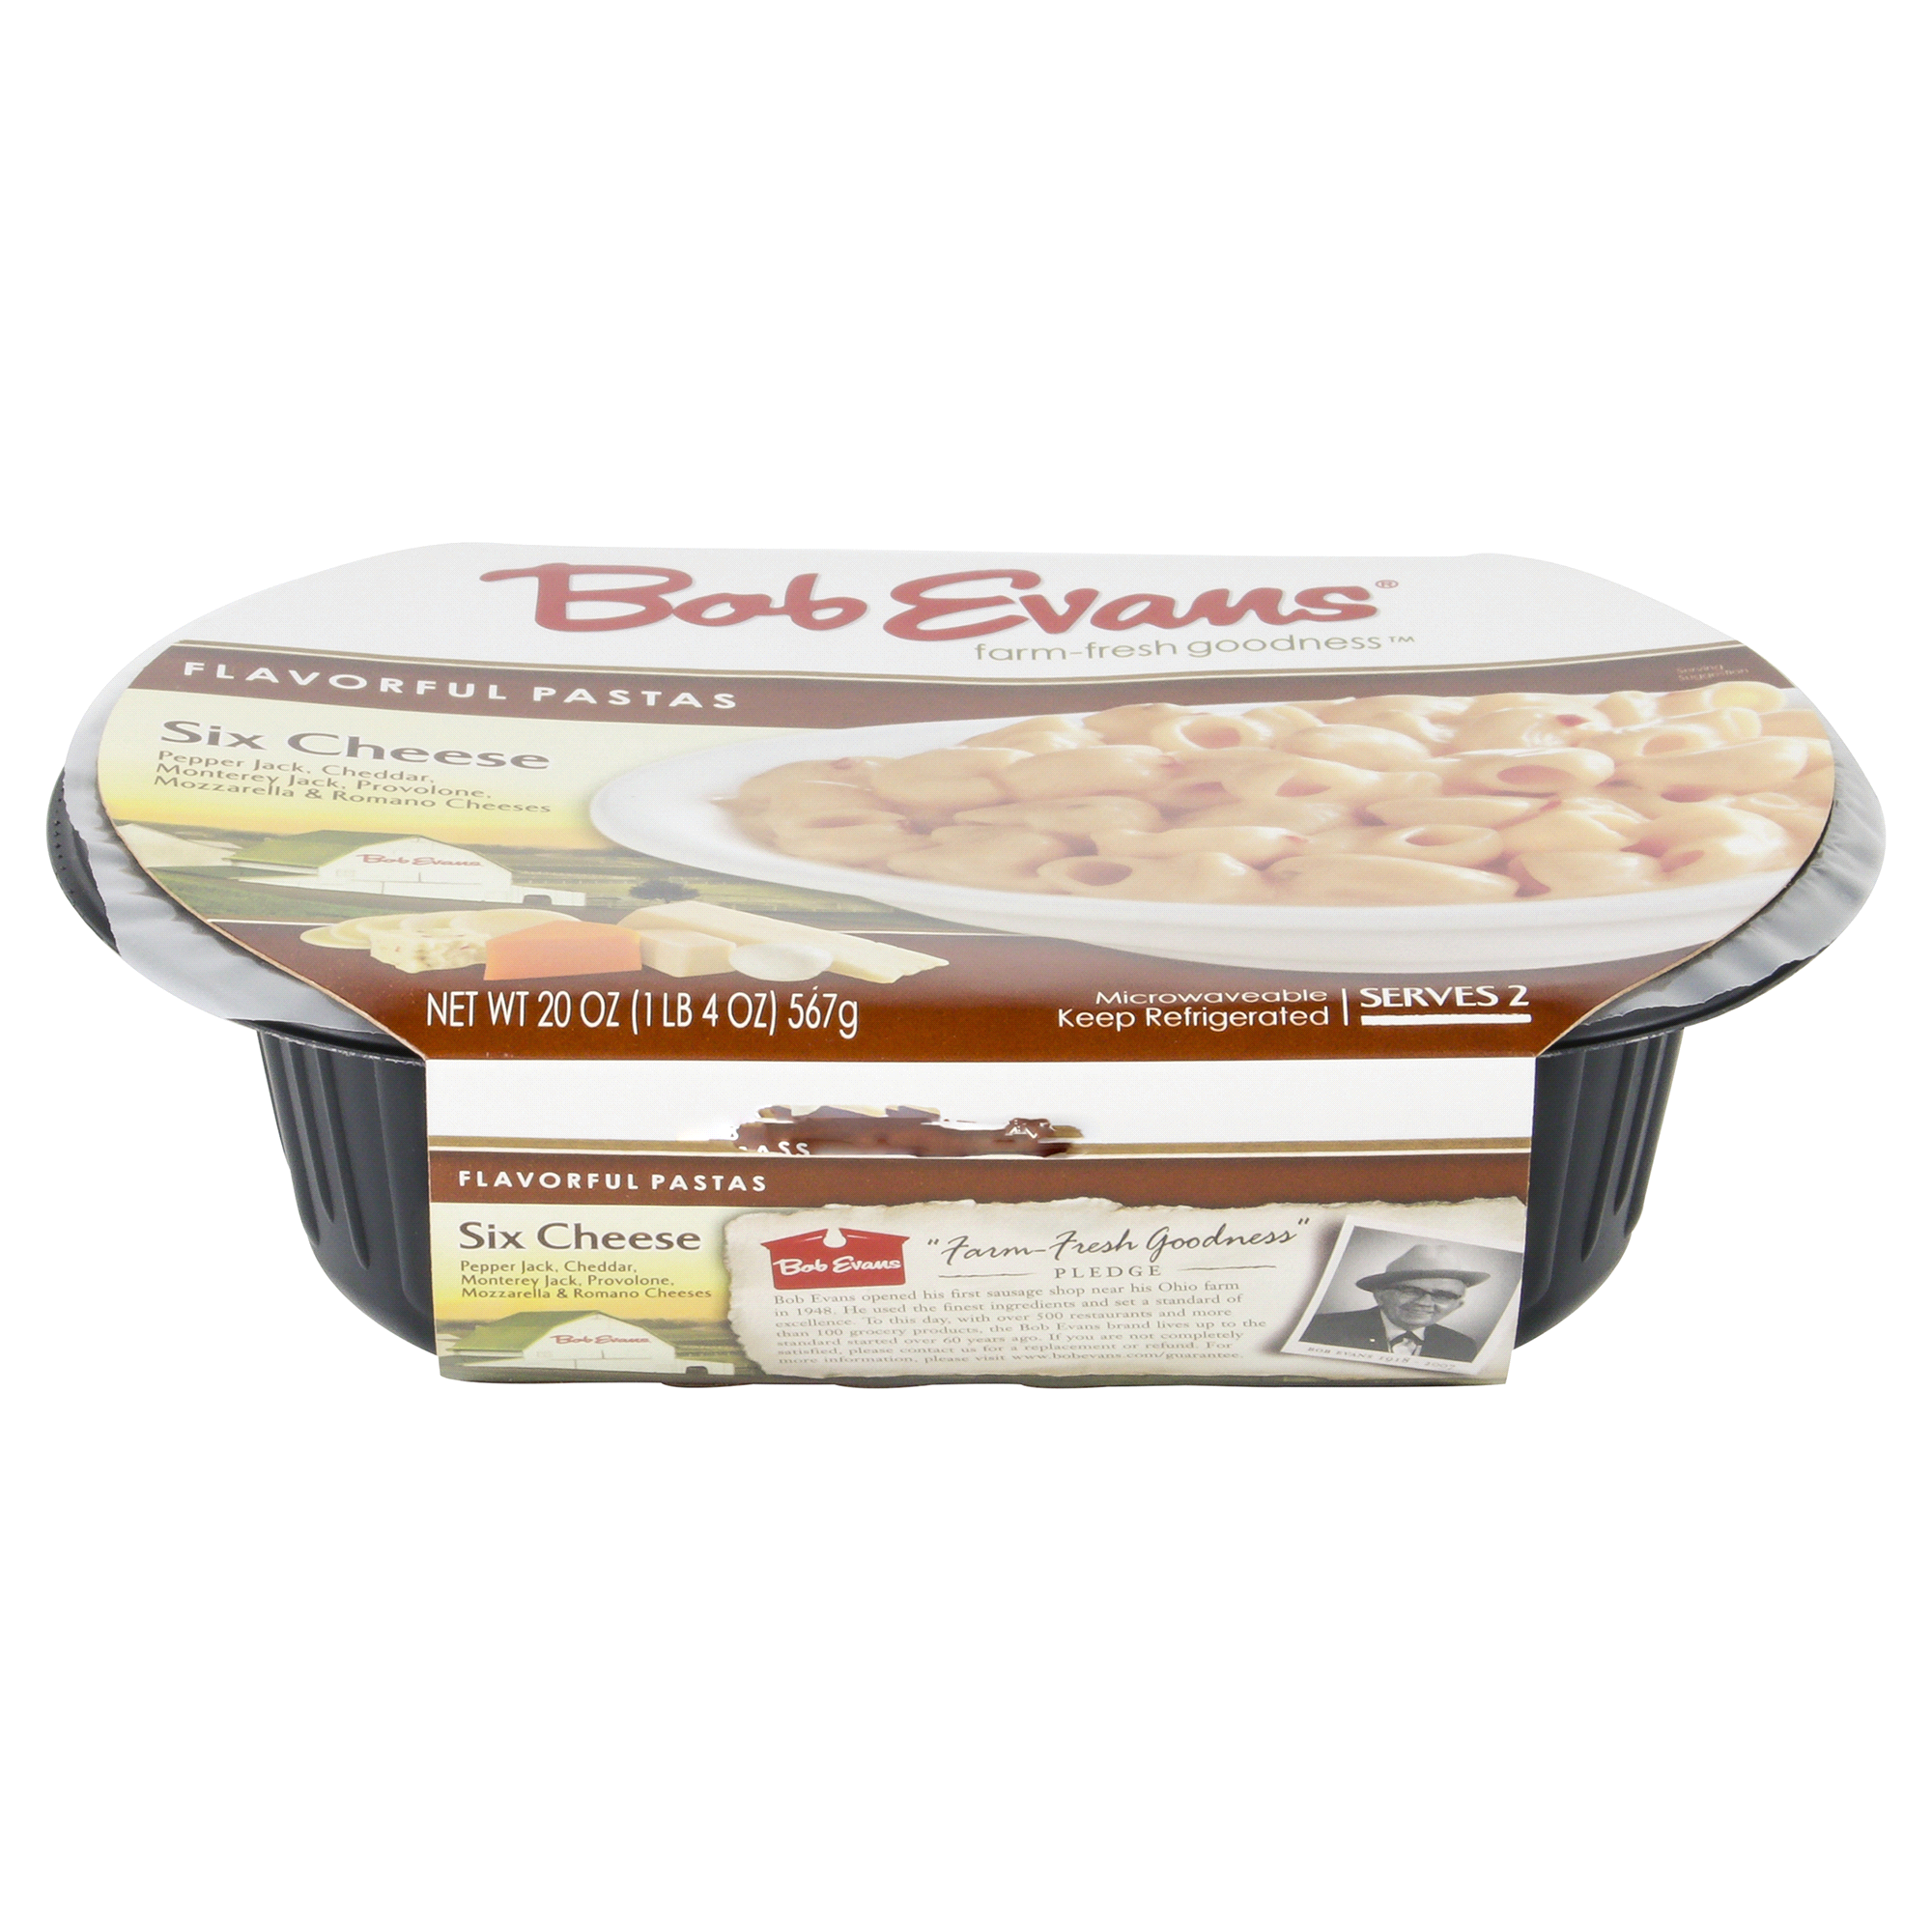 Bob Evans Flavorful Pastas Six Cheese 20 oz | Meijer.com